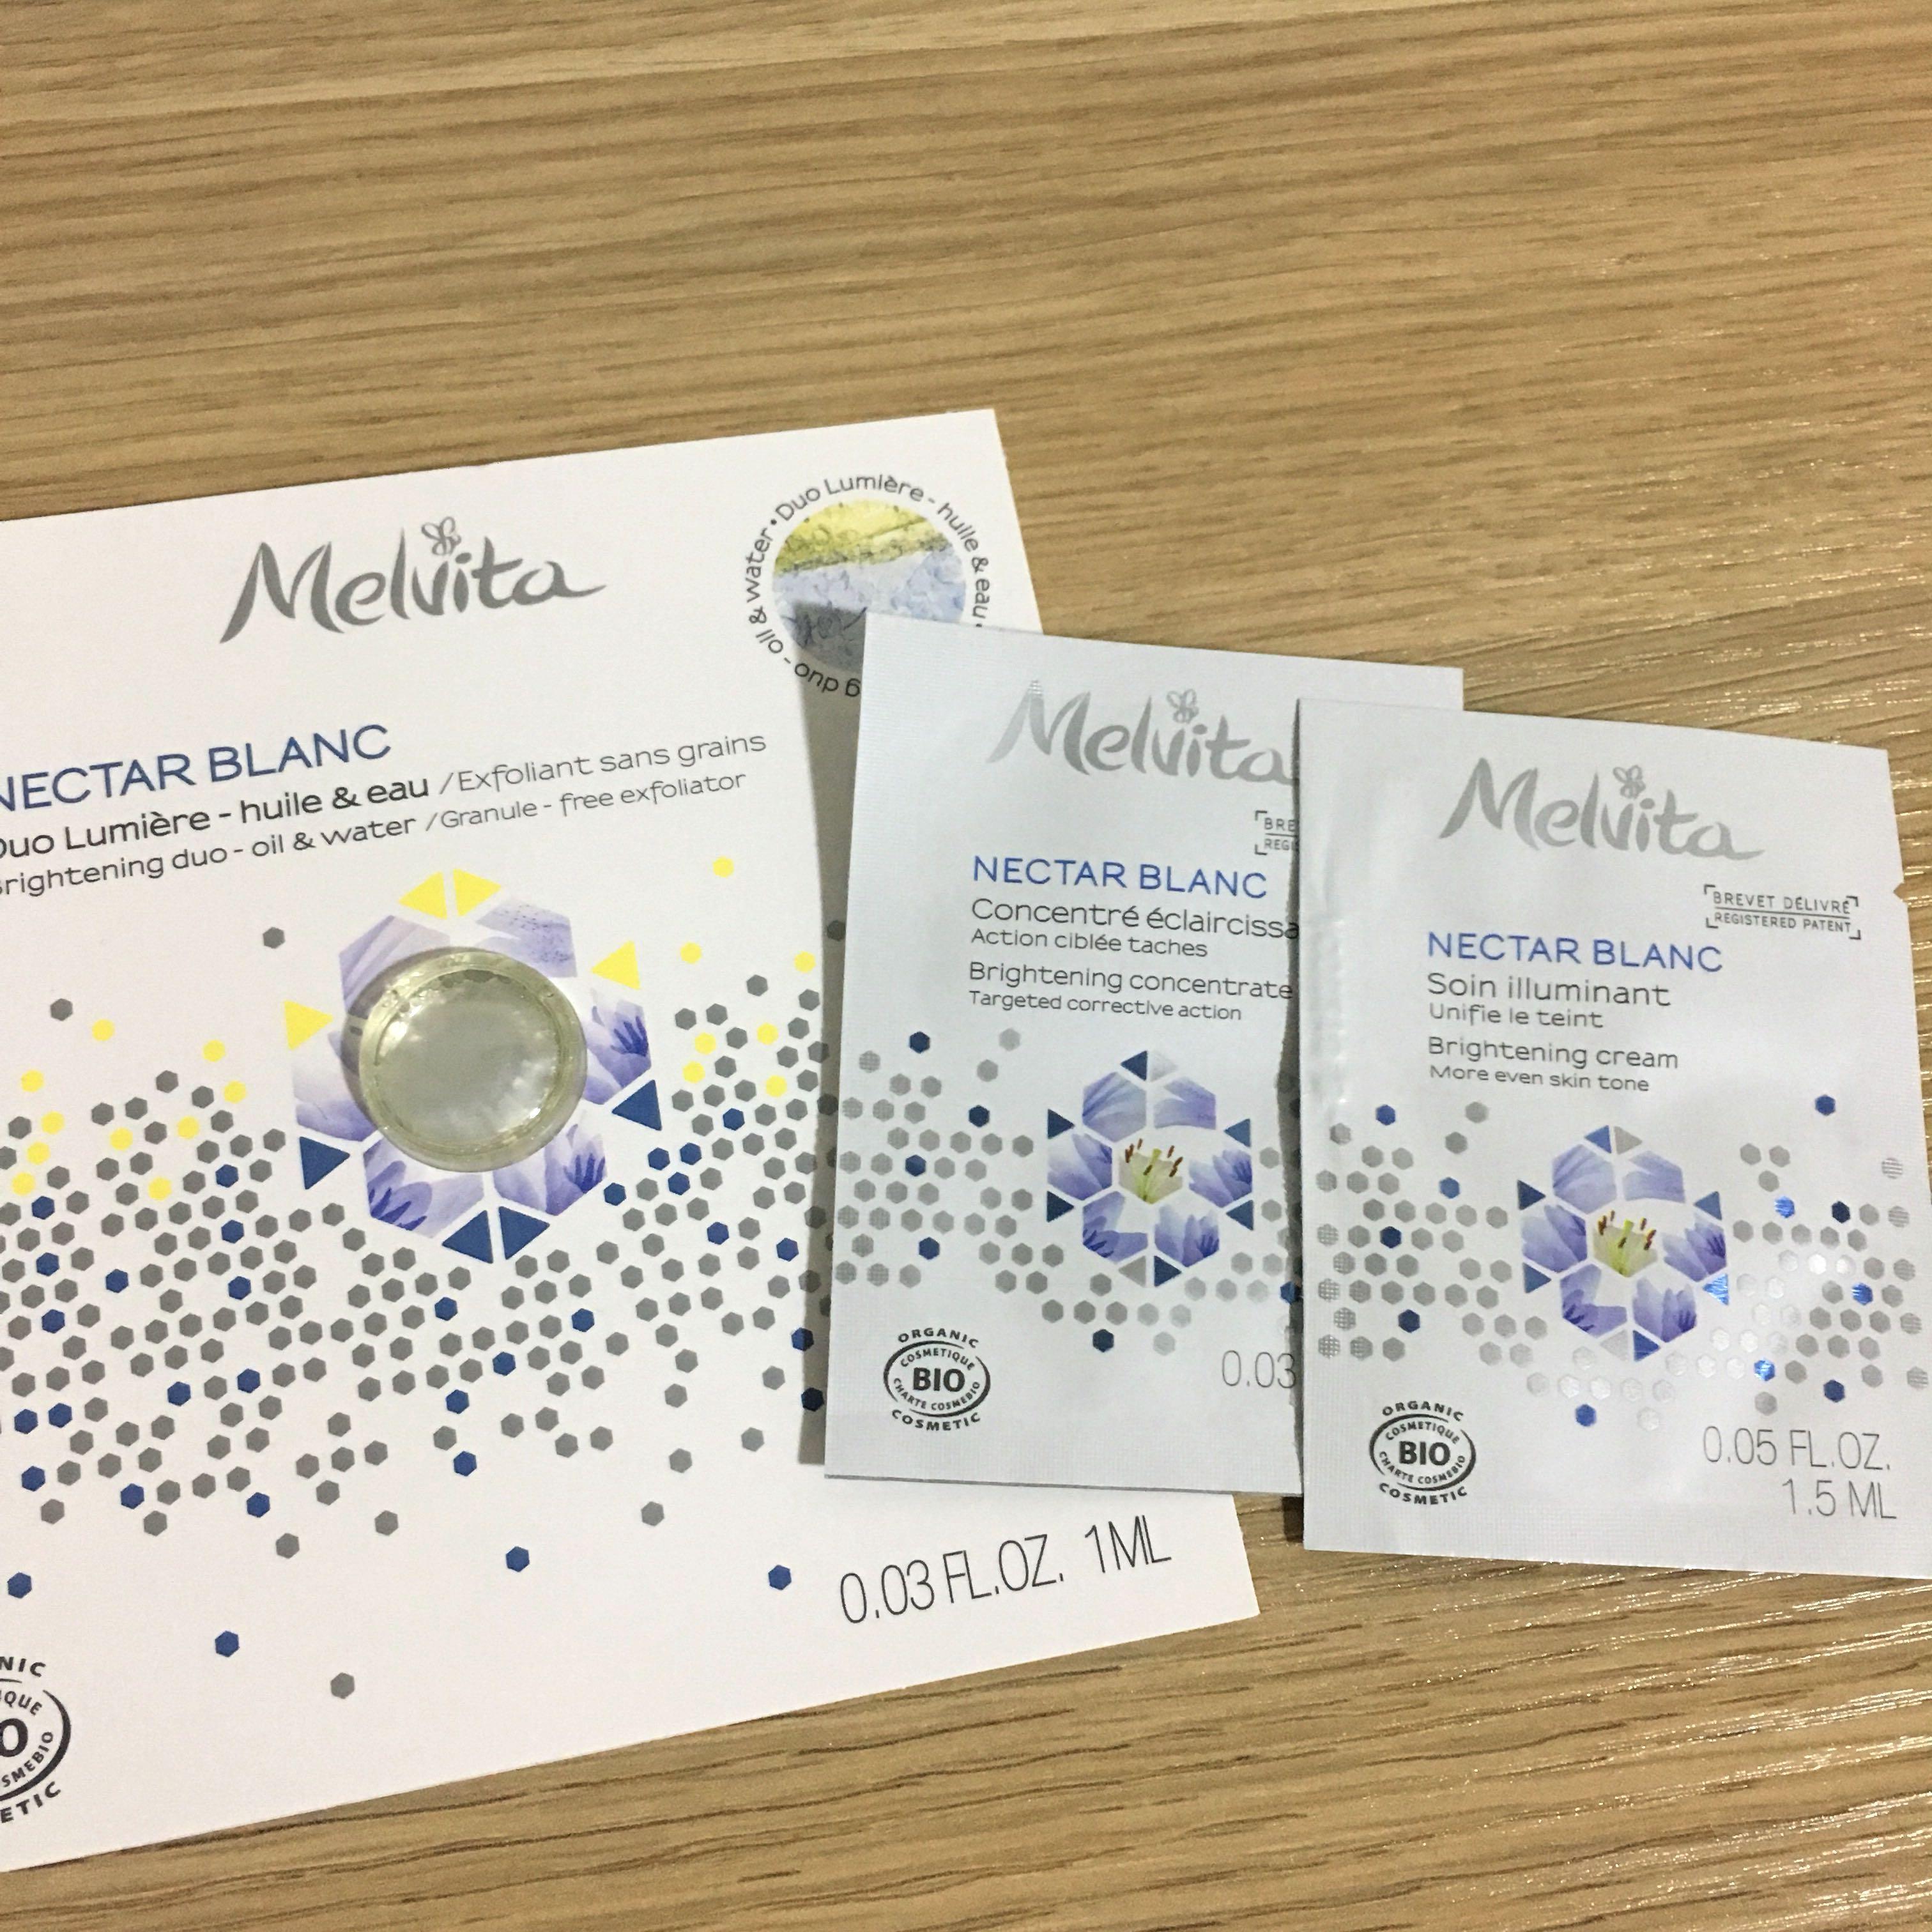 🌟 Melvita 有機透白光感美容液、精華、面霜 sample